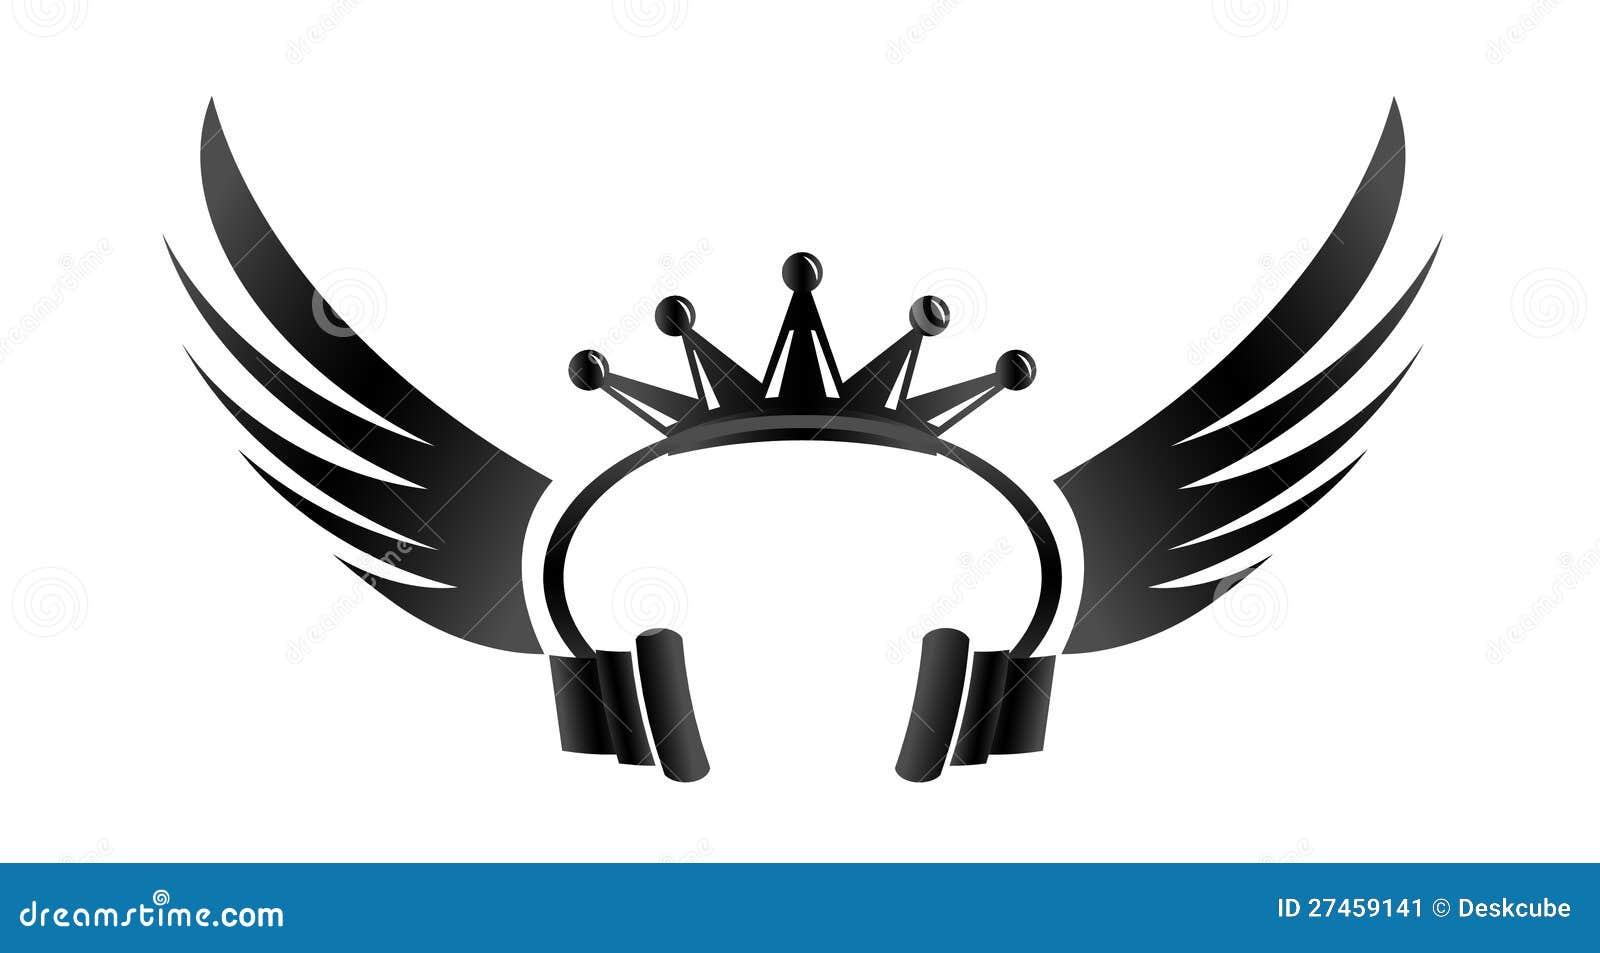 Top Logo Design » How To Design A Dj Logo - Creative Logo ...